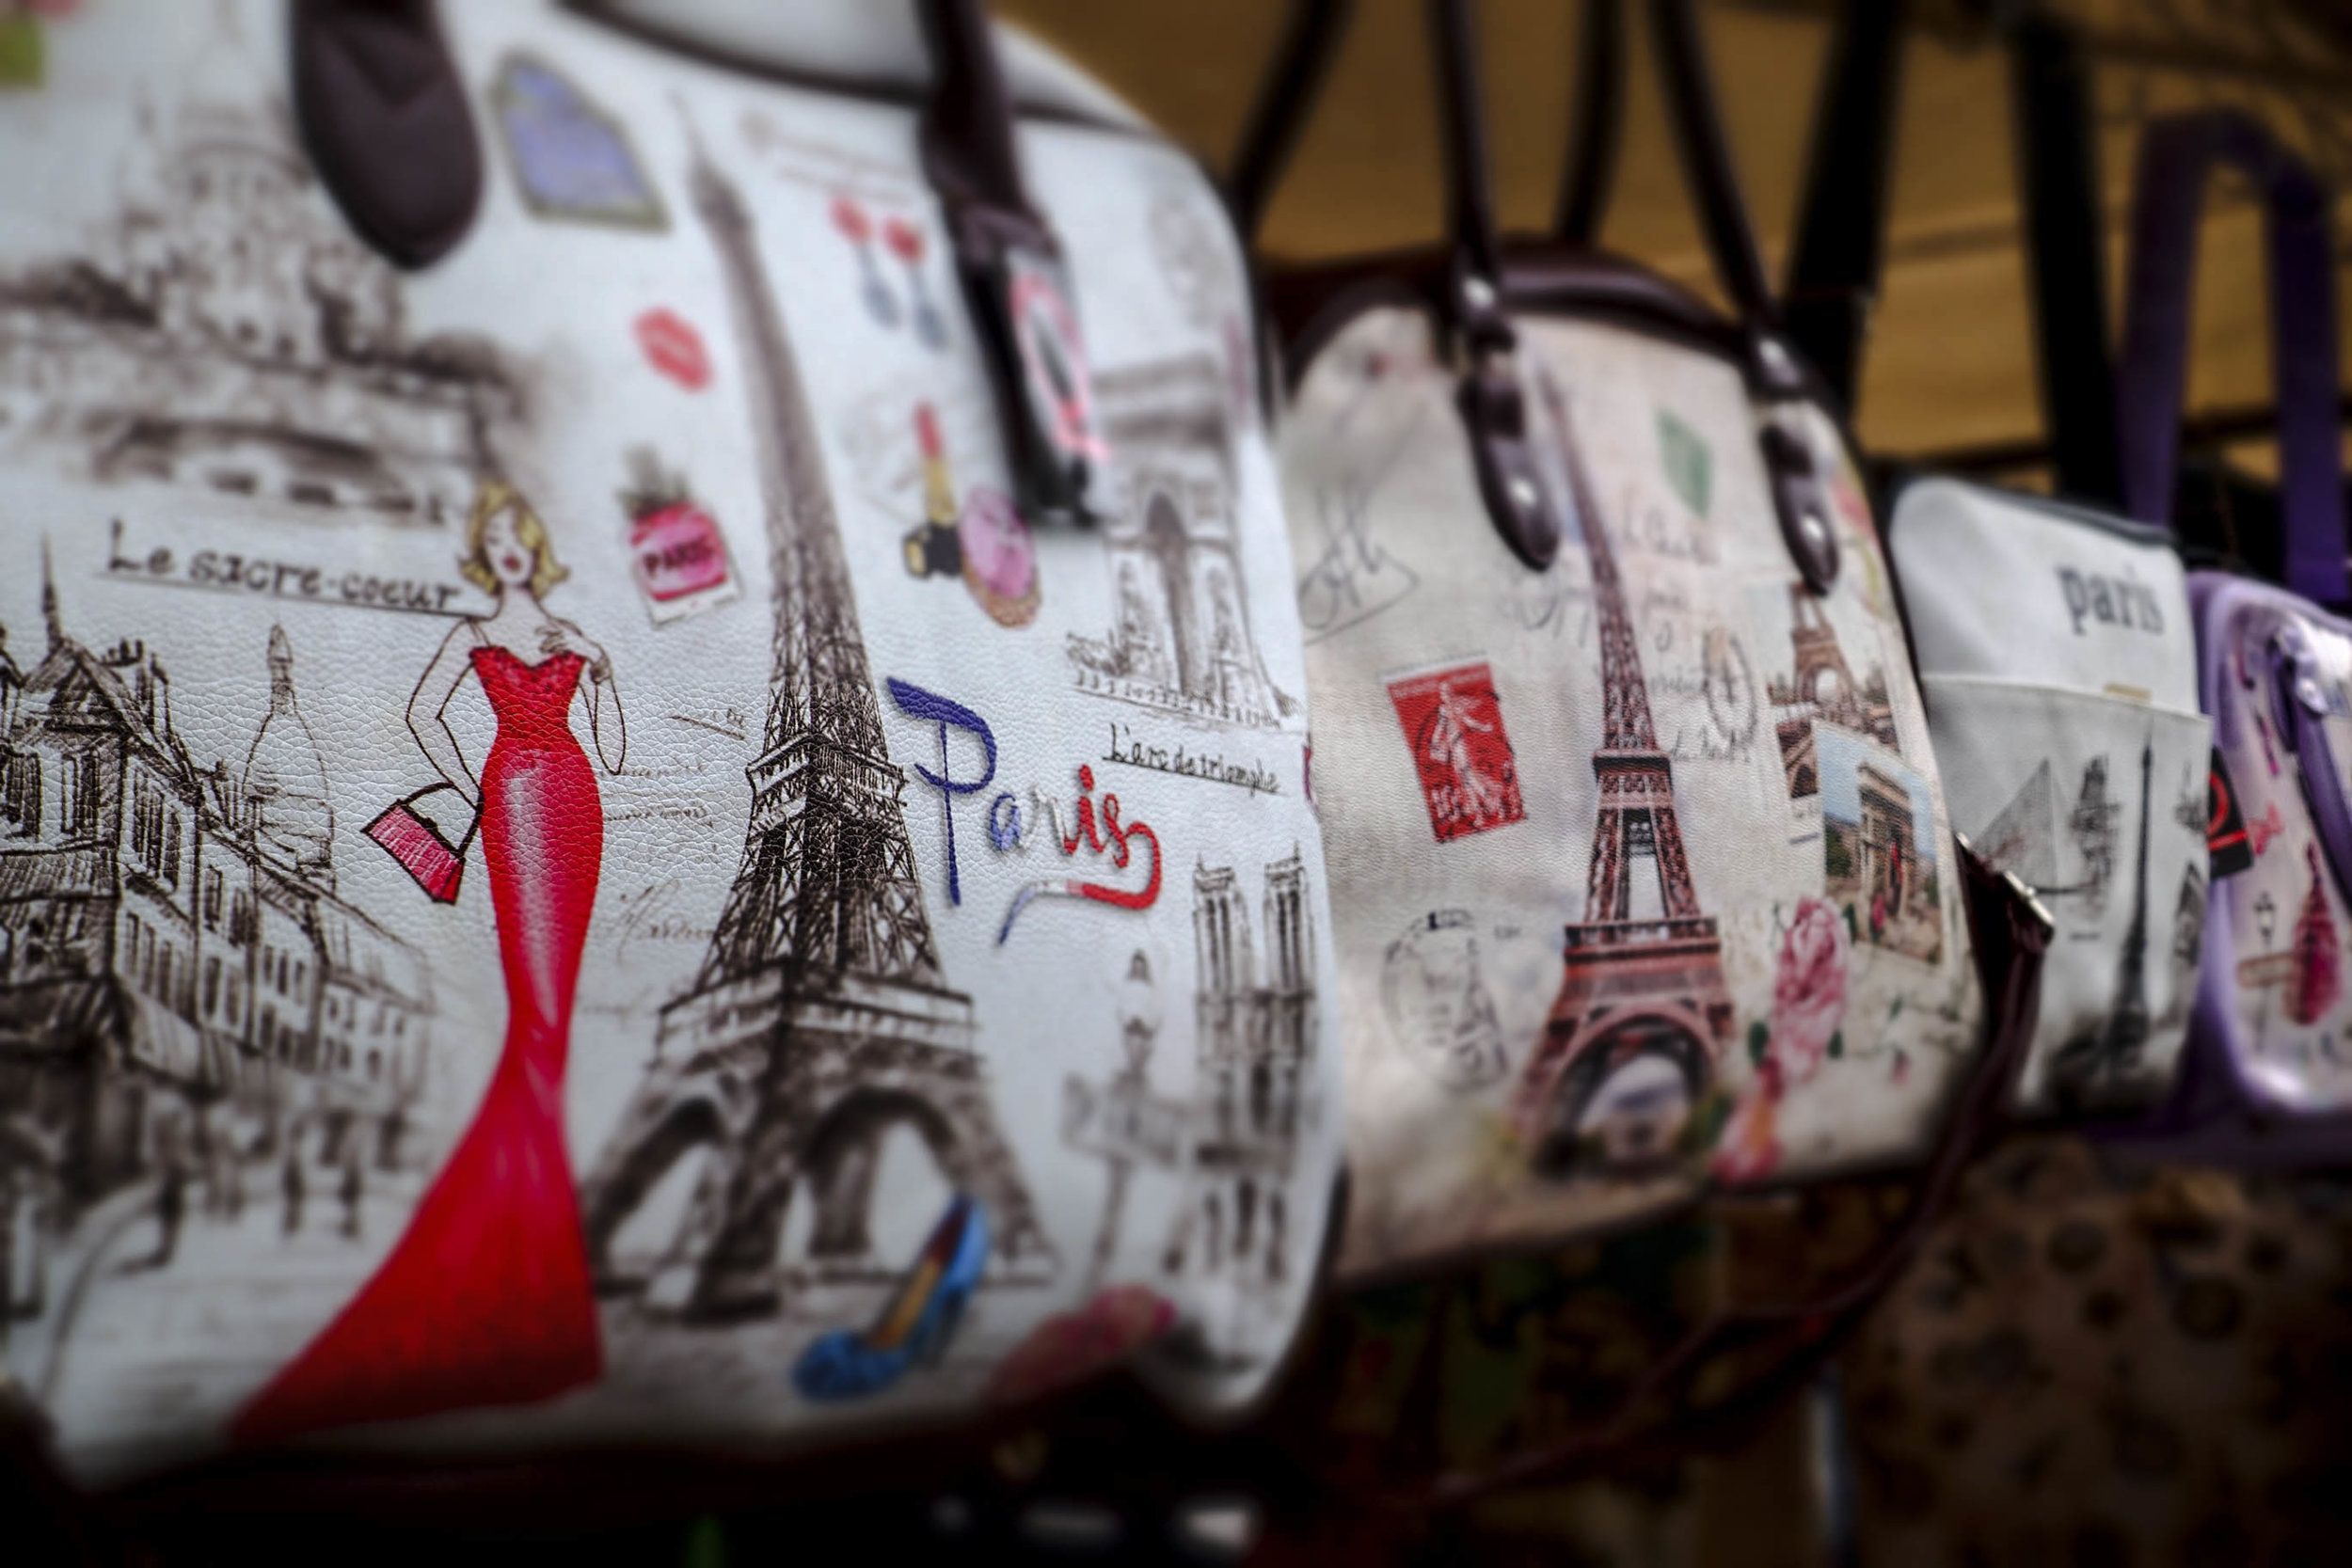 ParisHandbags2019 (1 of 1).jpg